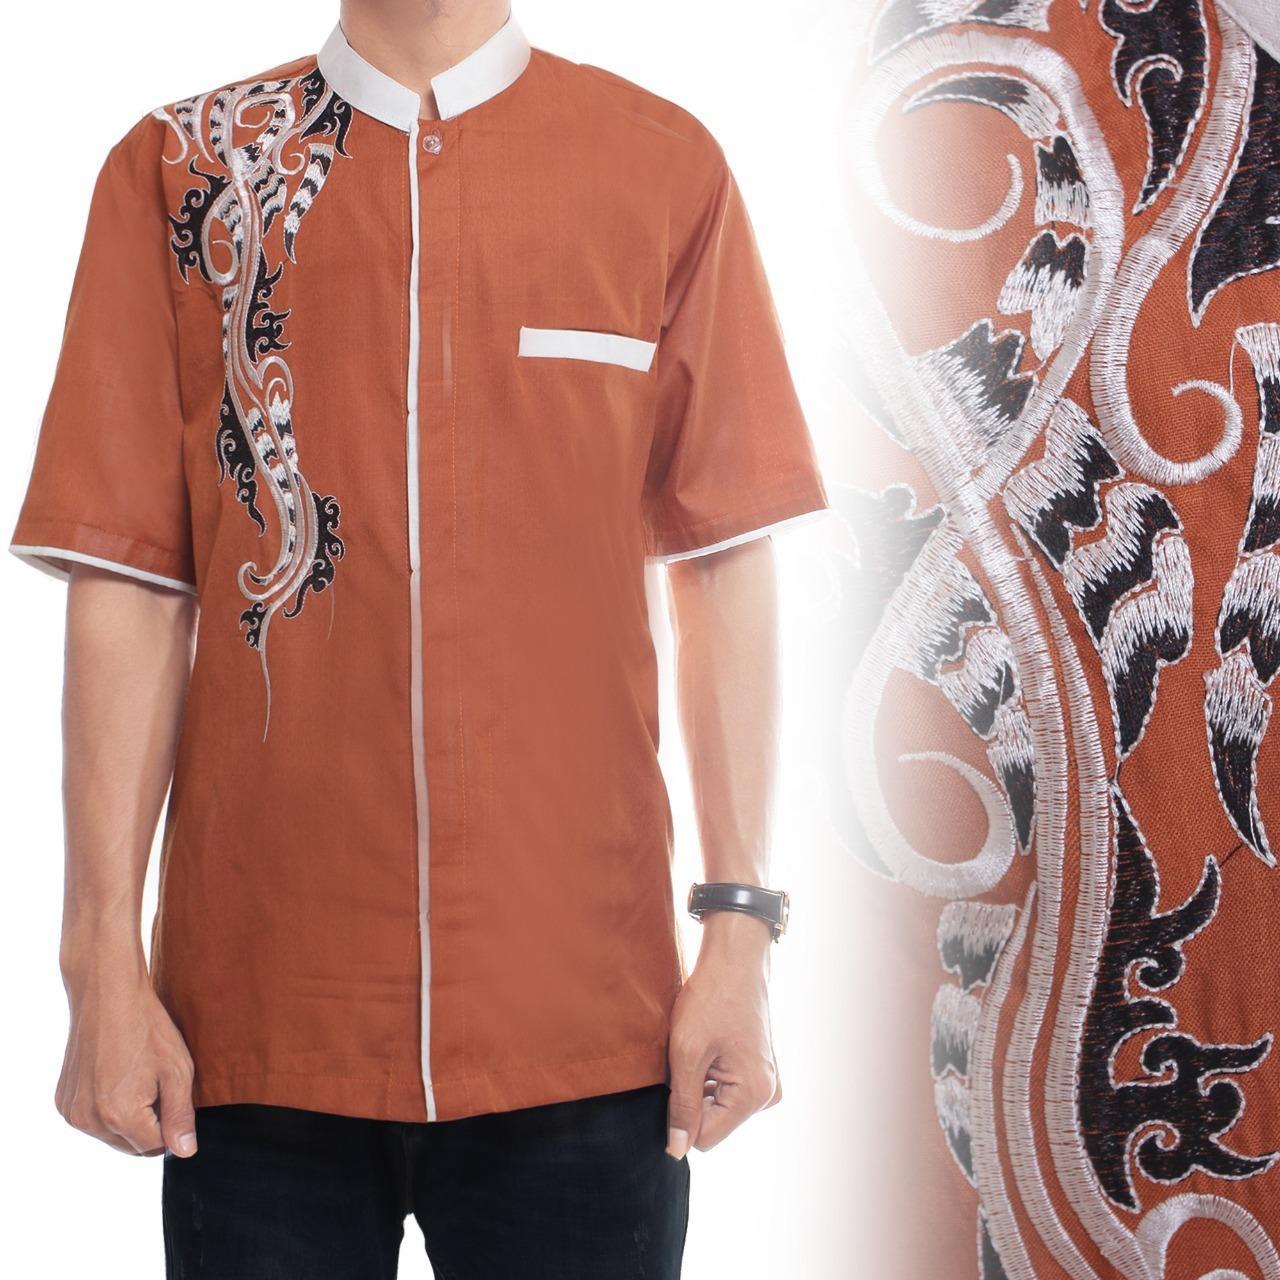 Glow fashion Baju koko atasan kemeja batik pria jumbo shirt Richi